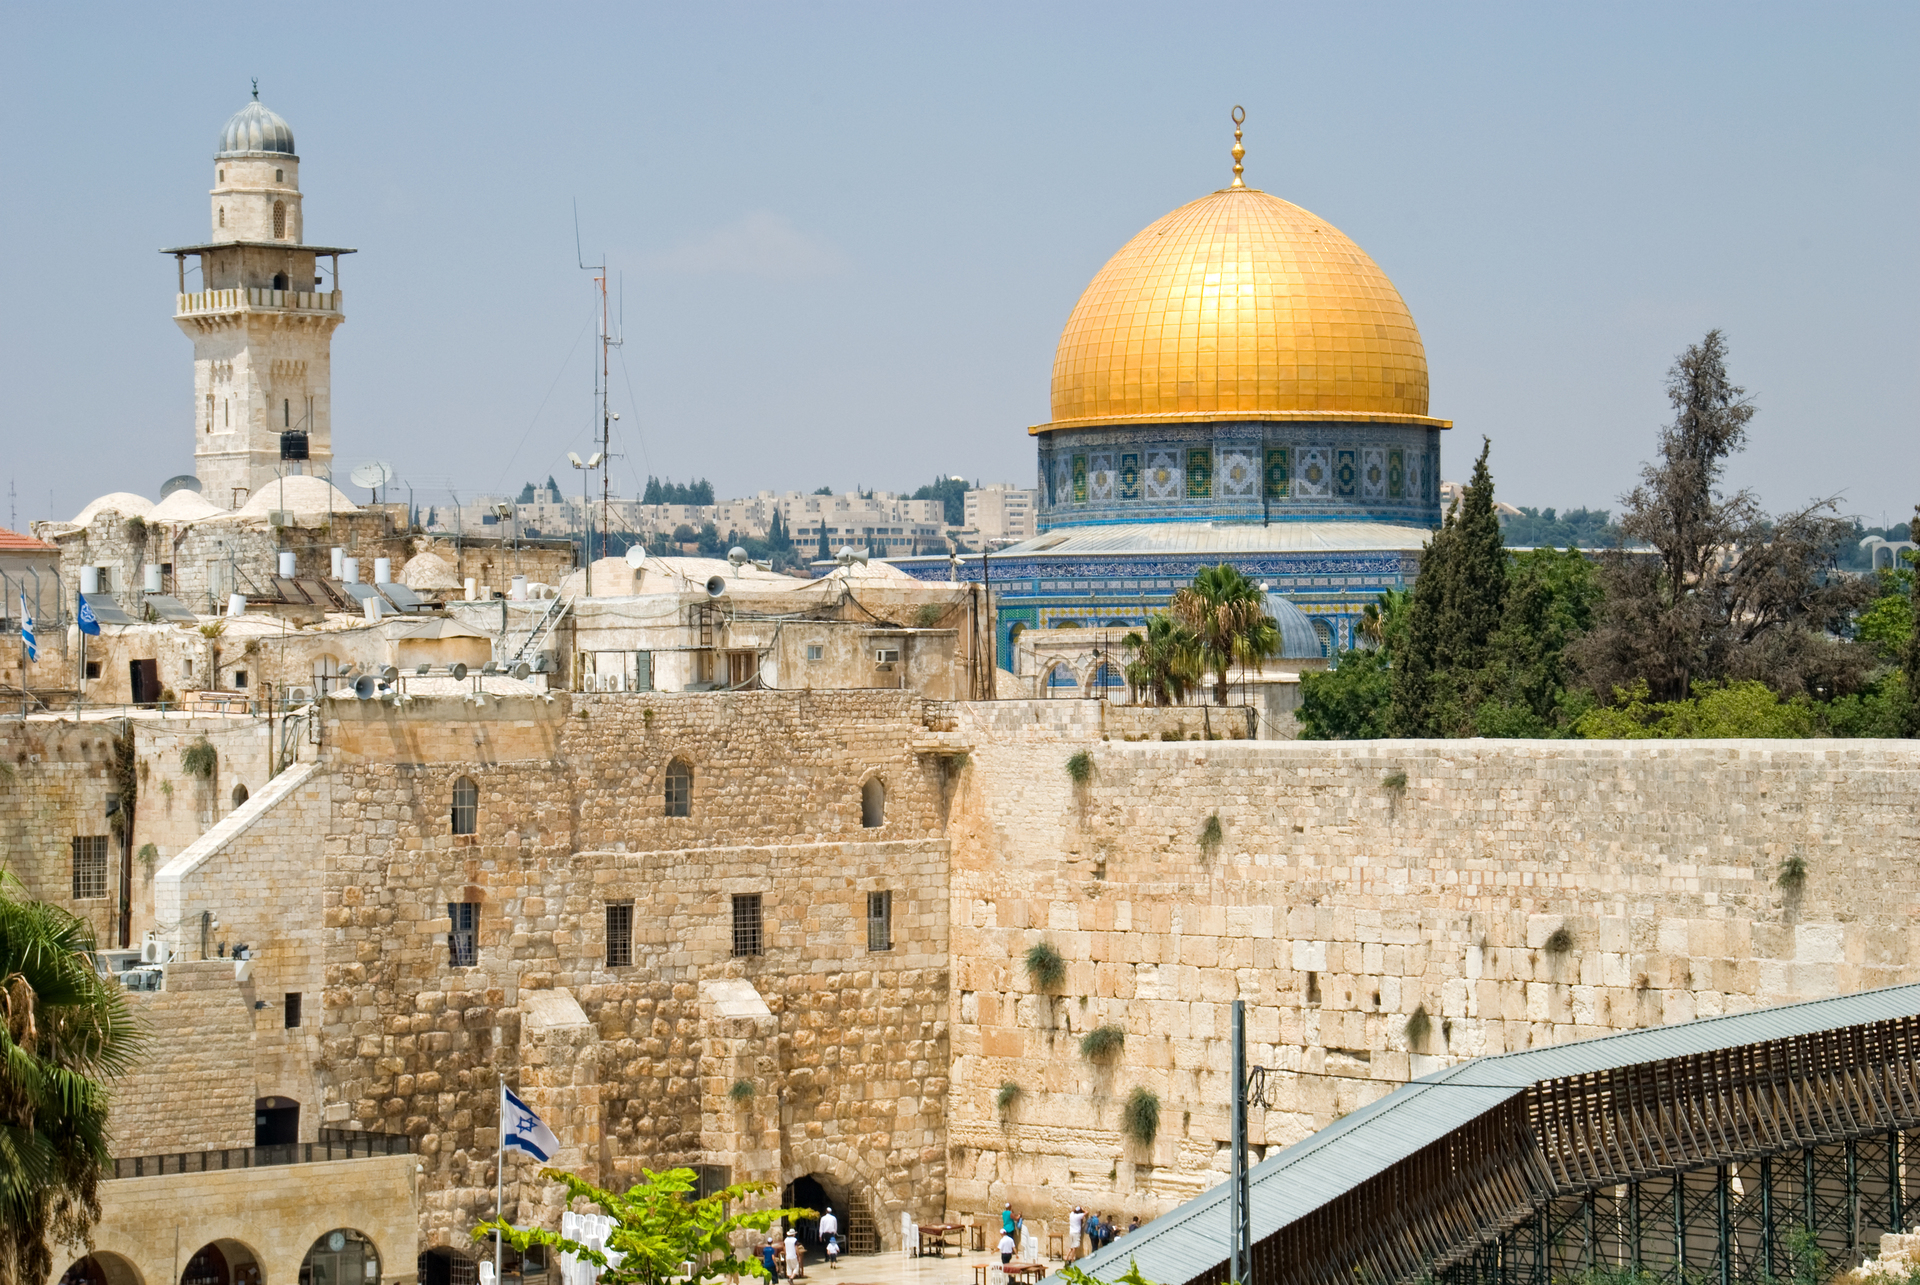 Gouden rotskoepel en Klaagmuur, Jeruzalem, Israël